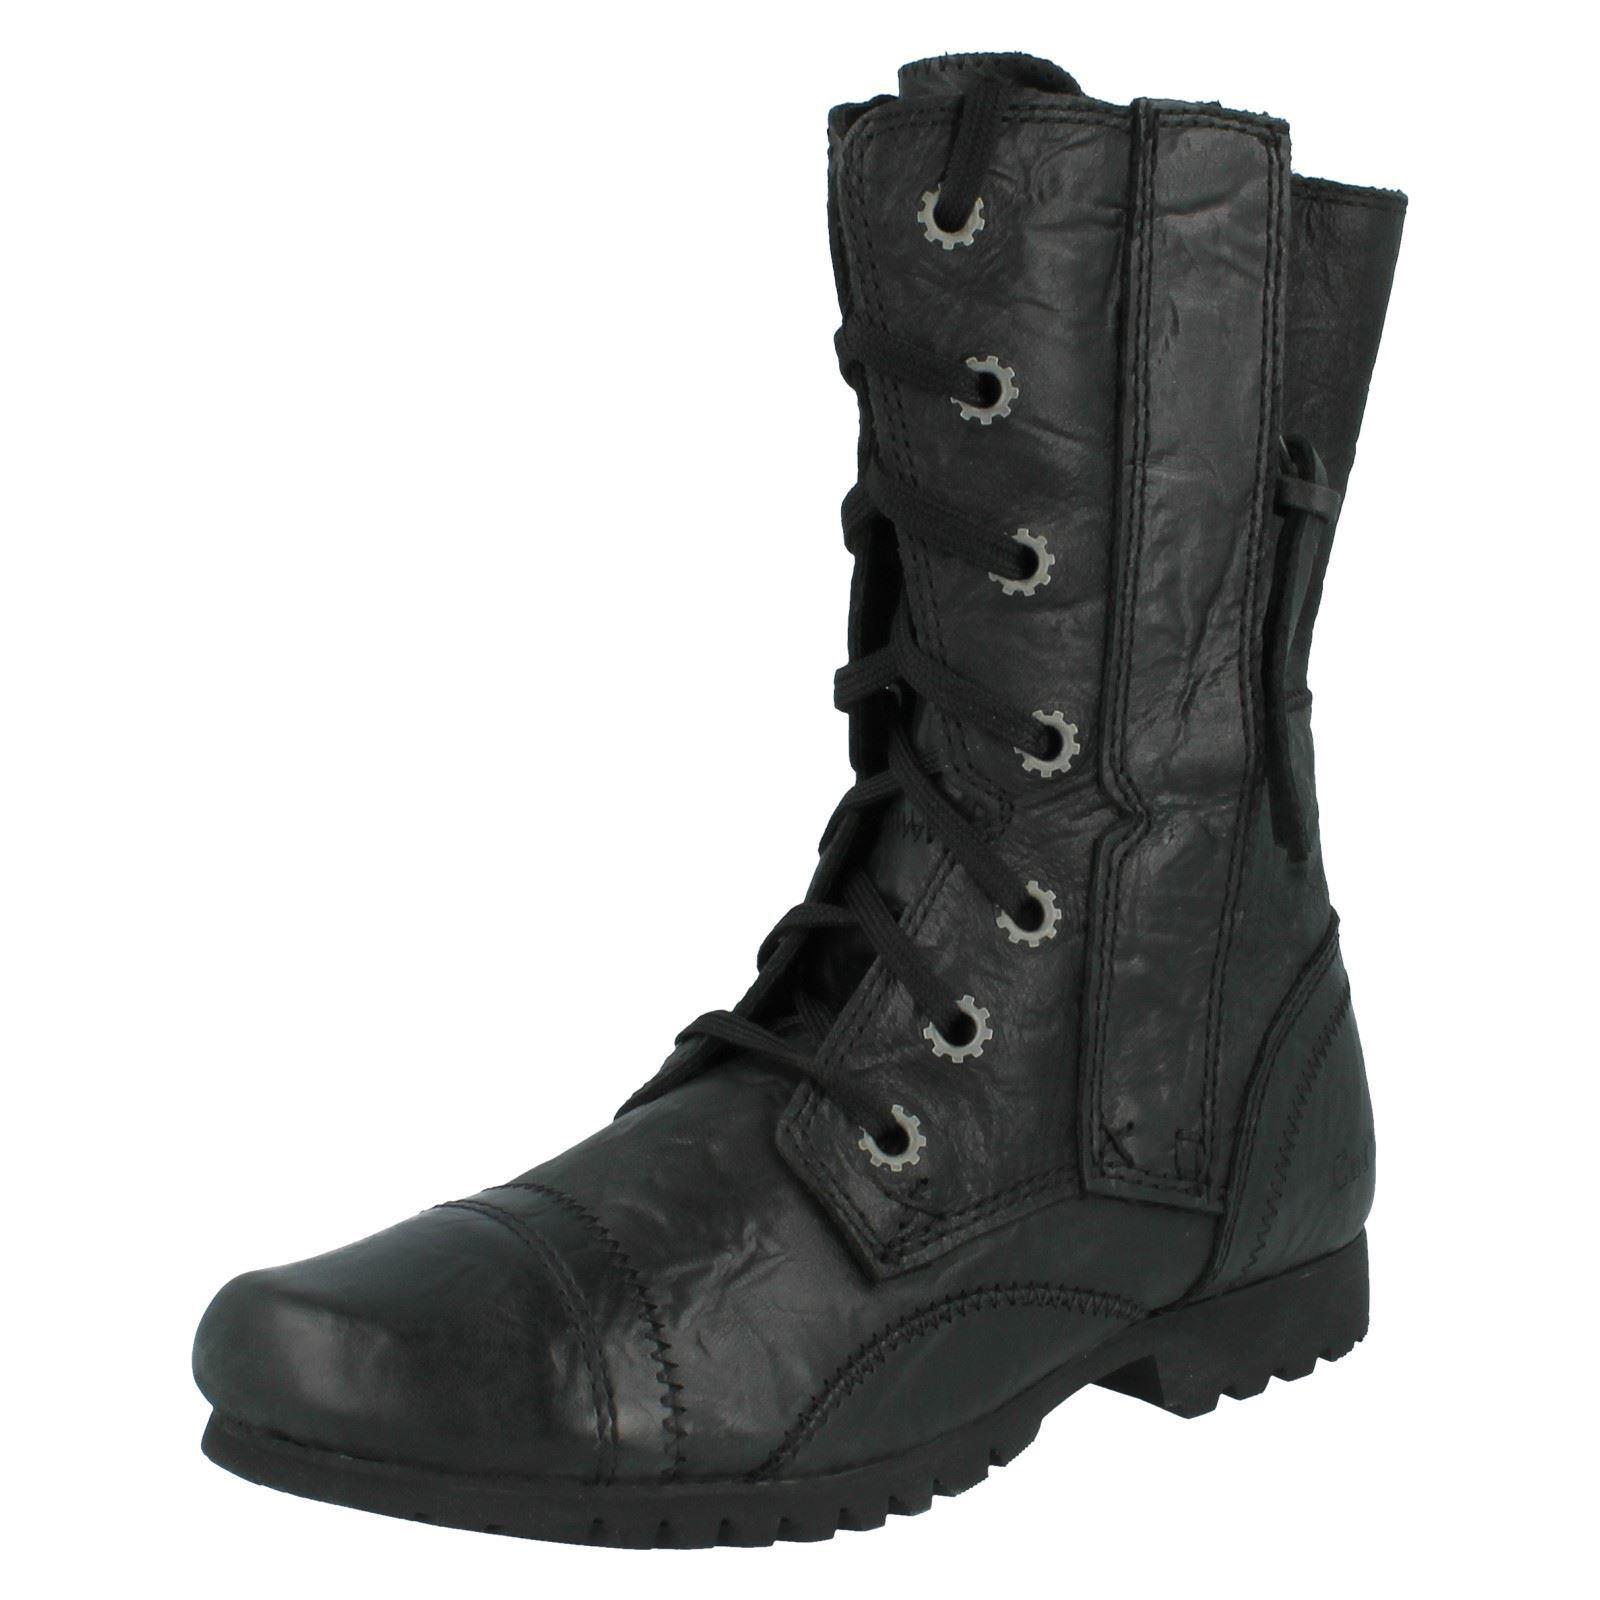 Man's/Woman's Womens Caterpillar Boots Jane Diverse new design Pleasant appearance Caramel, gentle